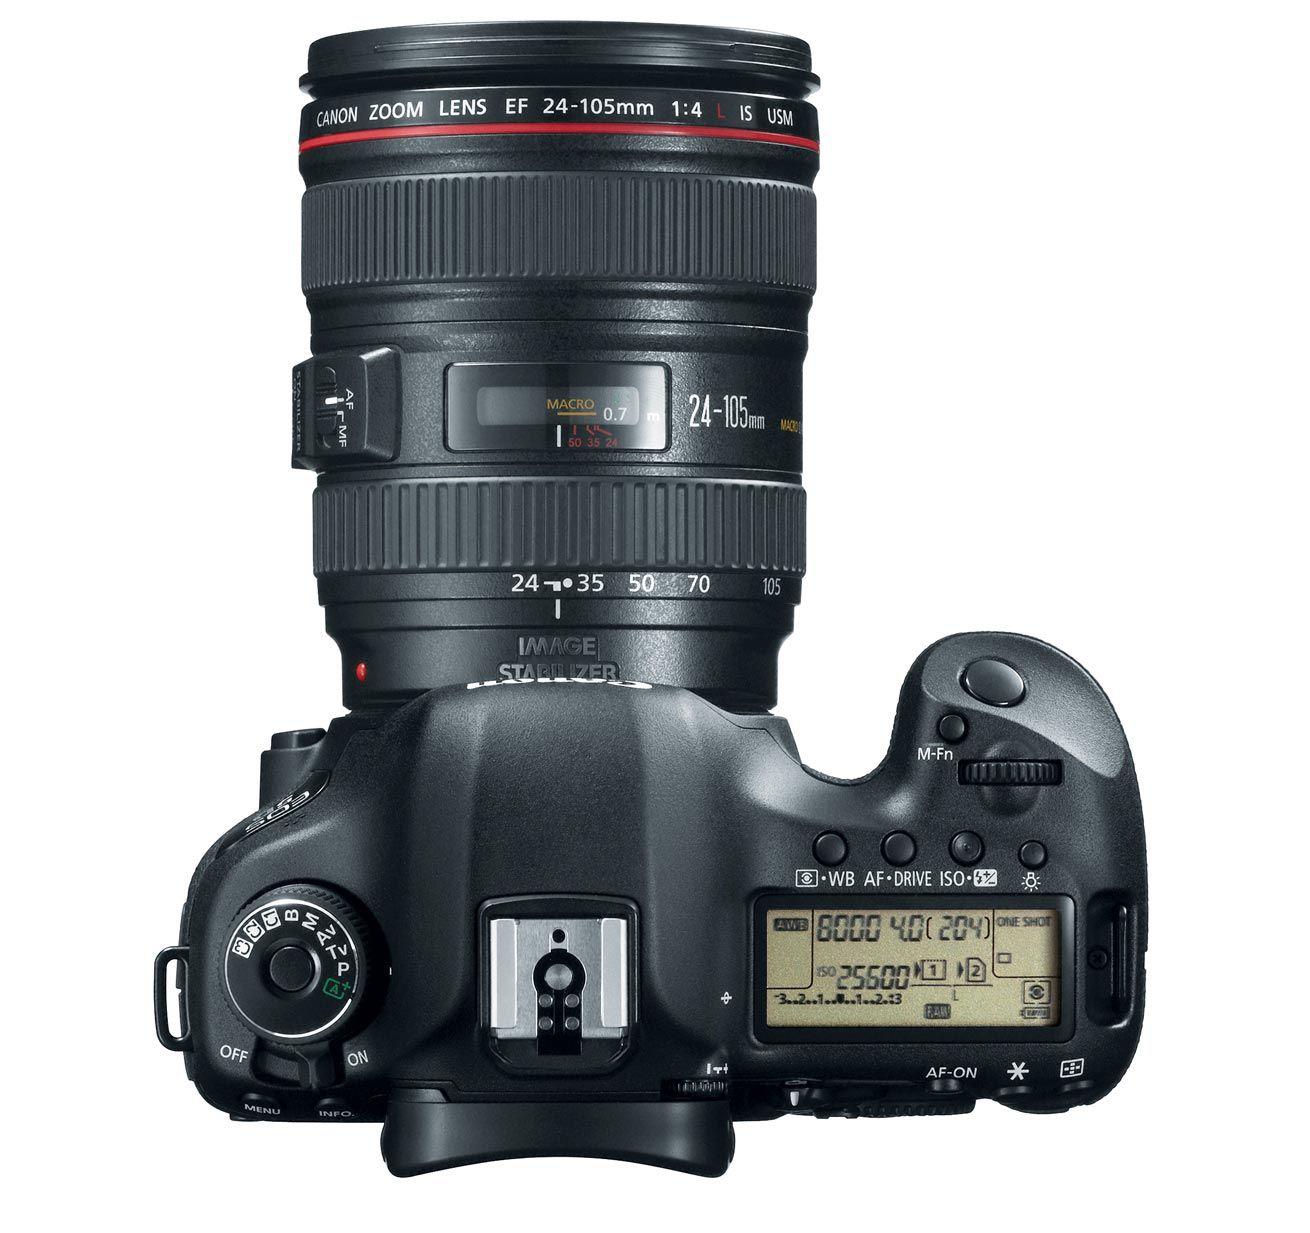 The Next Chapter In Dslr Canon 5d Mark Iii Canon Eos Canon 5d Mark Iii Hd Digital Camera